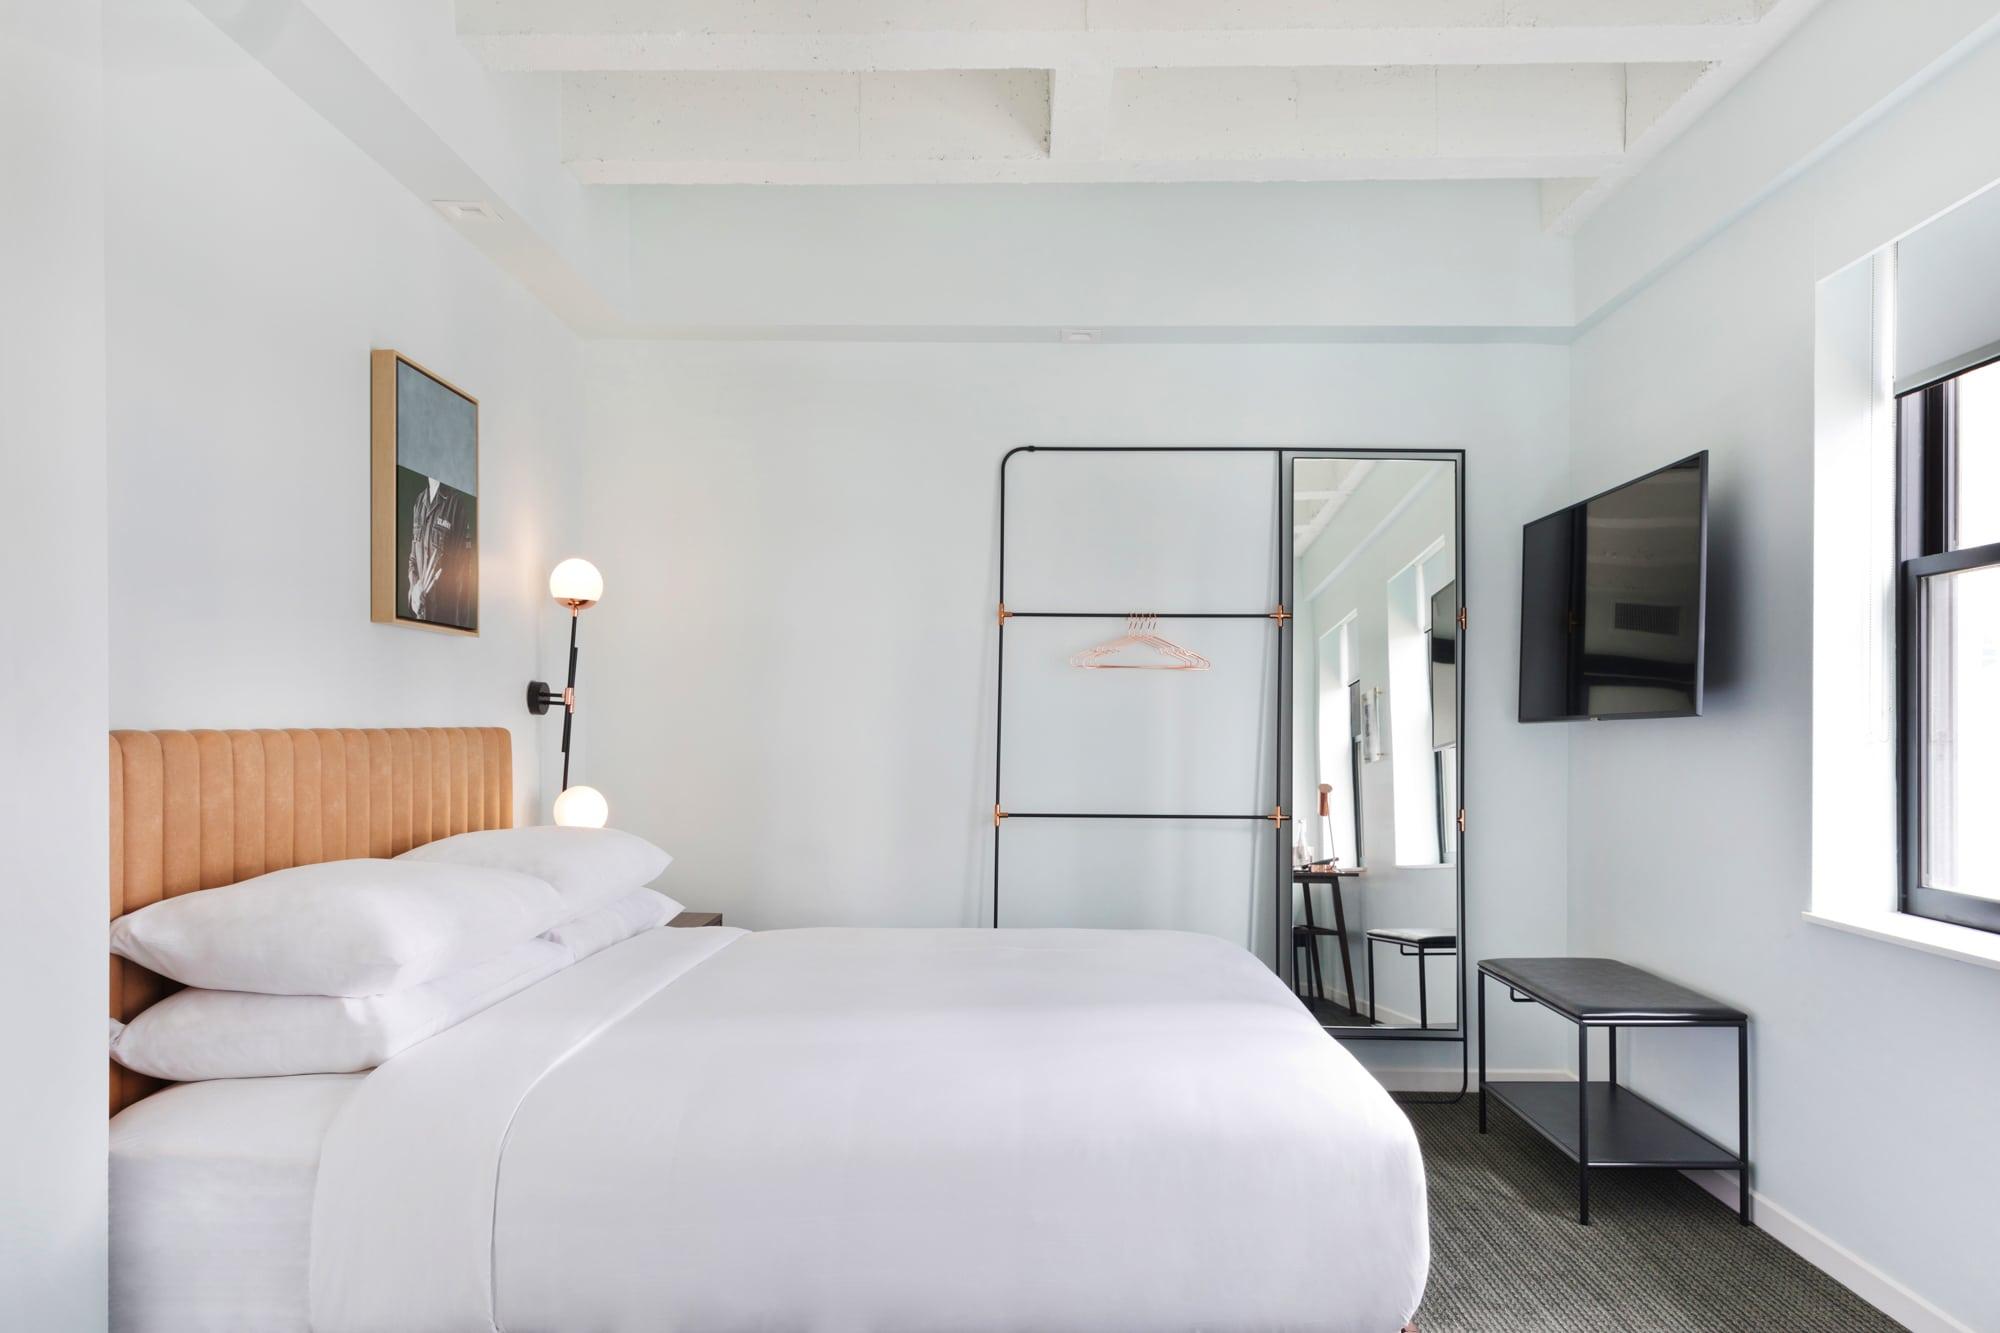 Journeyman king room with fresh white interior.